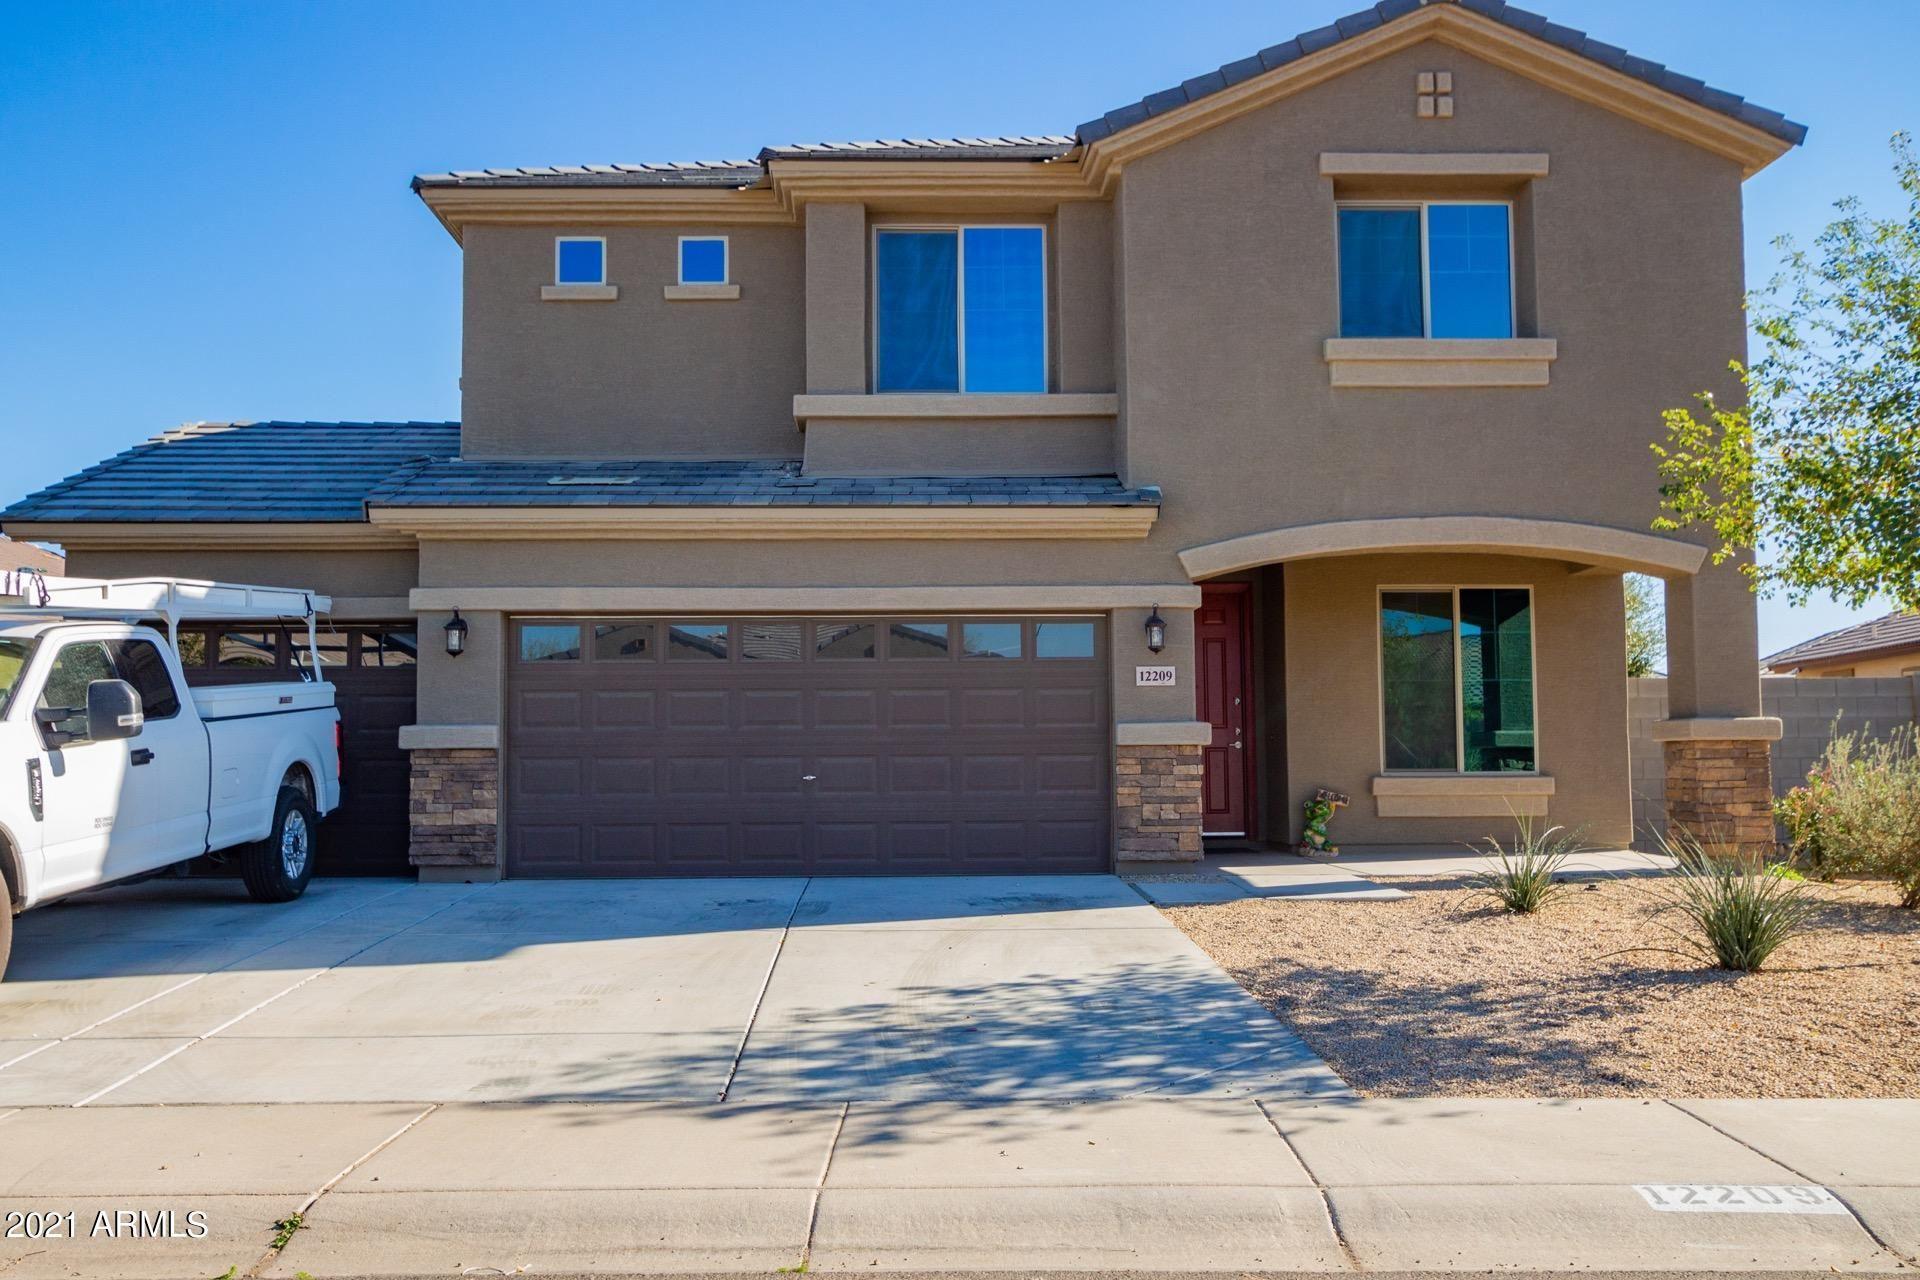 Photo of 12209 W WINSLOW Avenue, Tolleson, AZ 85353 (MLS # 6199391)